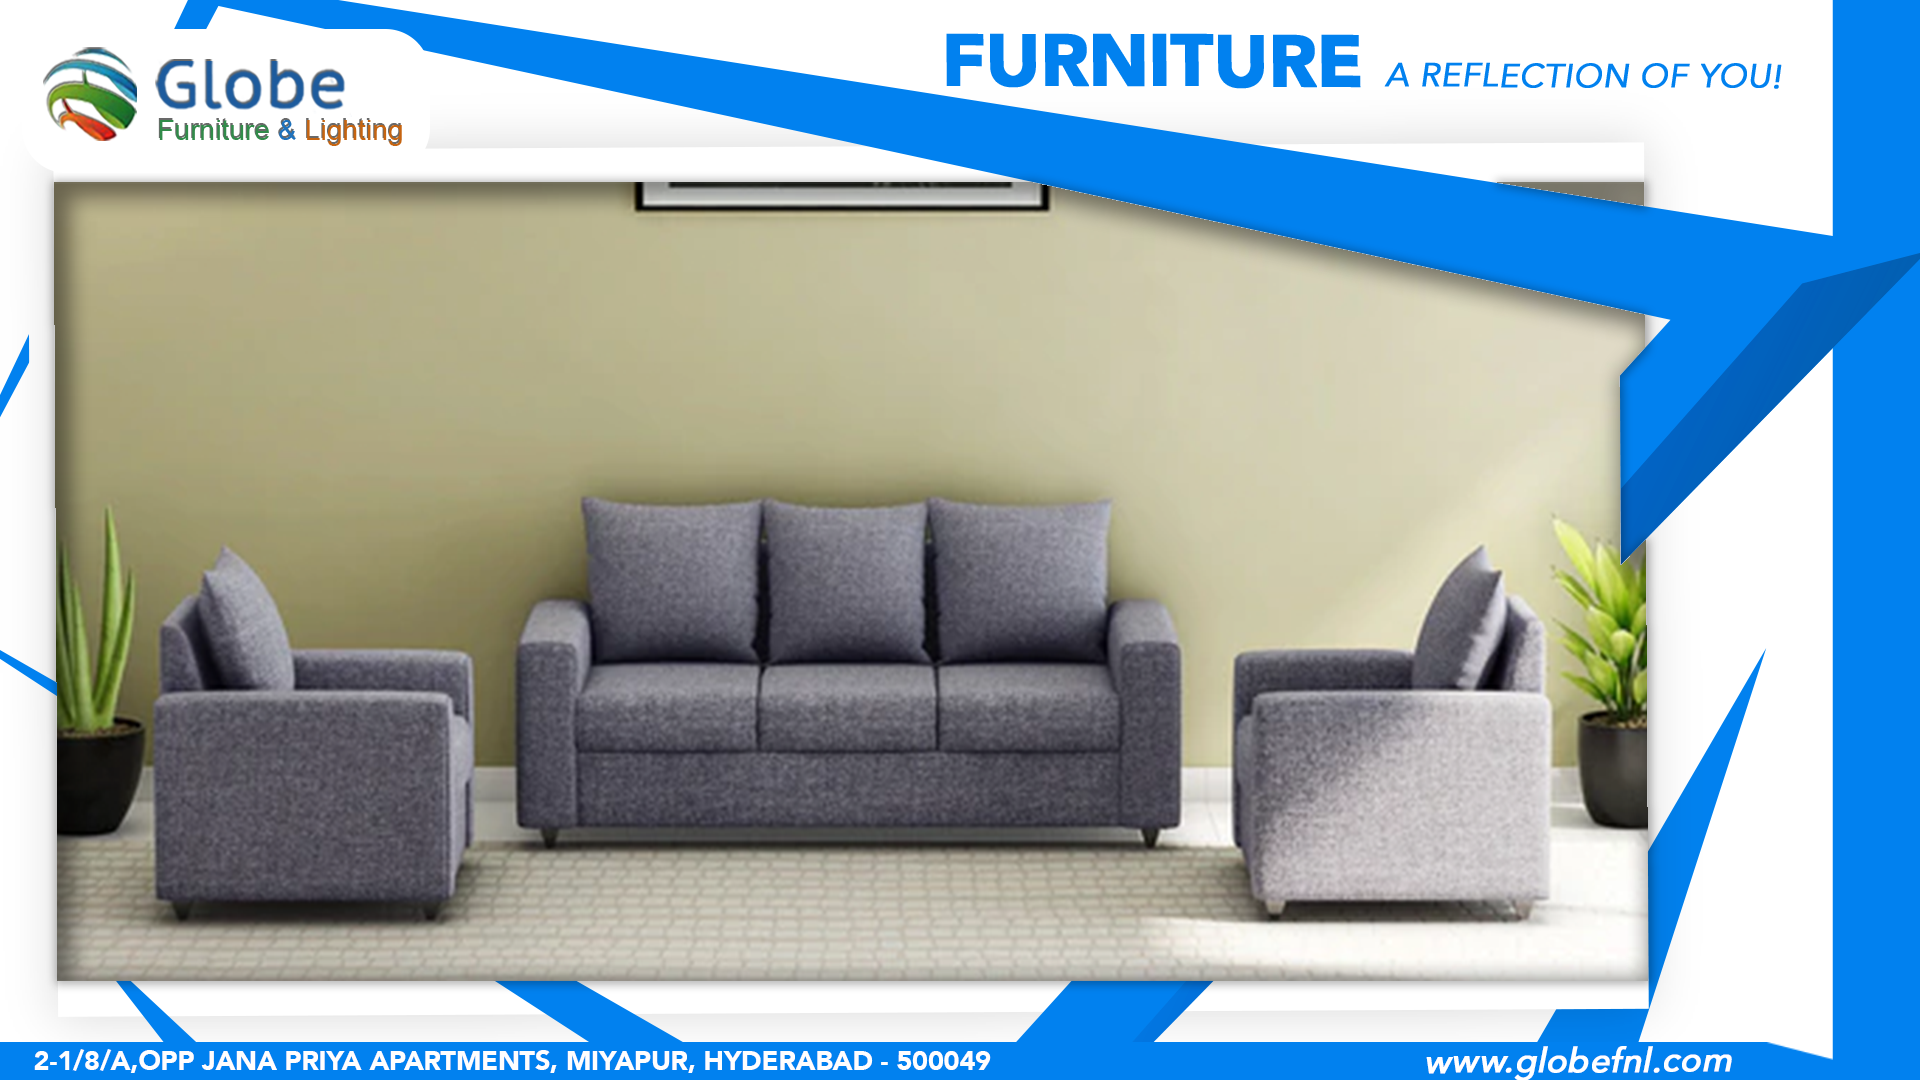 Globe Furniture And Lightinings In 2020 Globe Furniture Furniture Home Decor